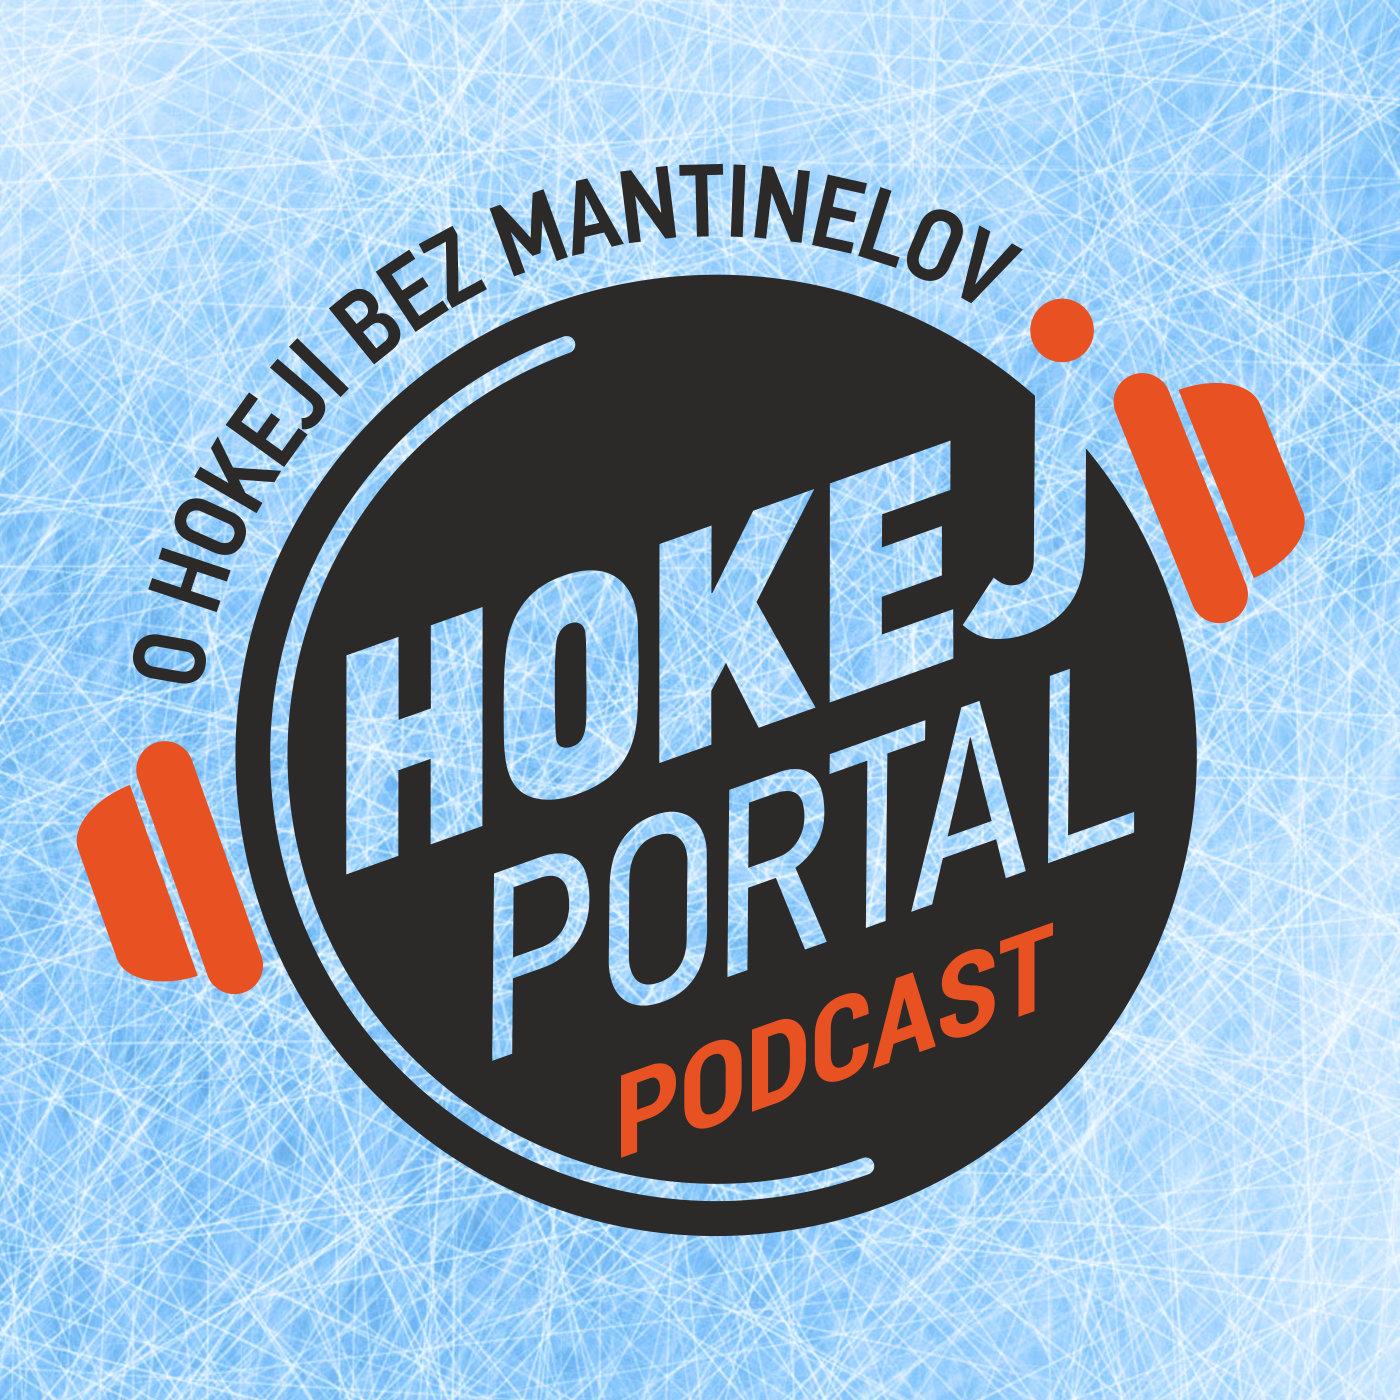 Hokejportal - Podcast